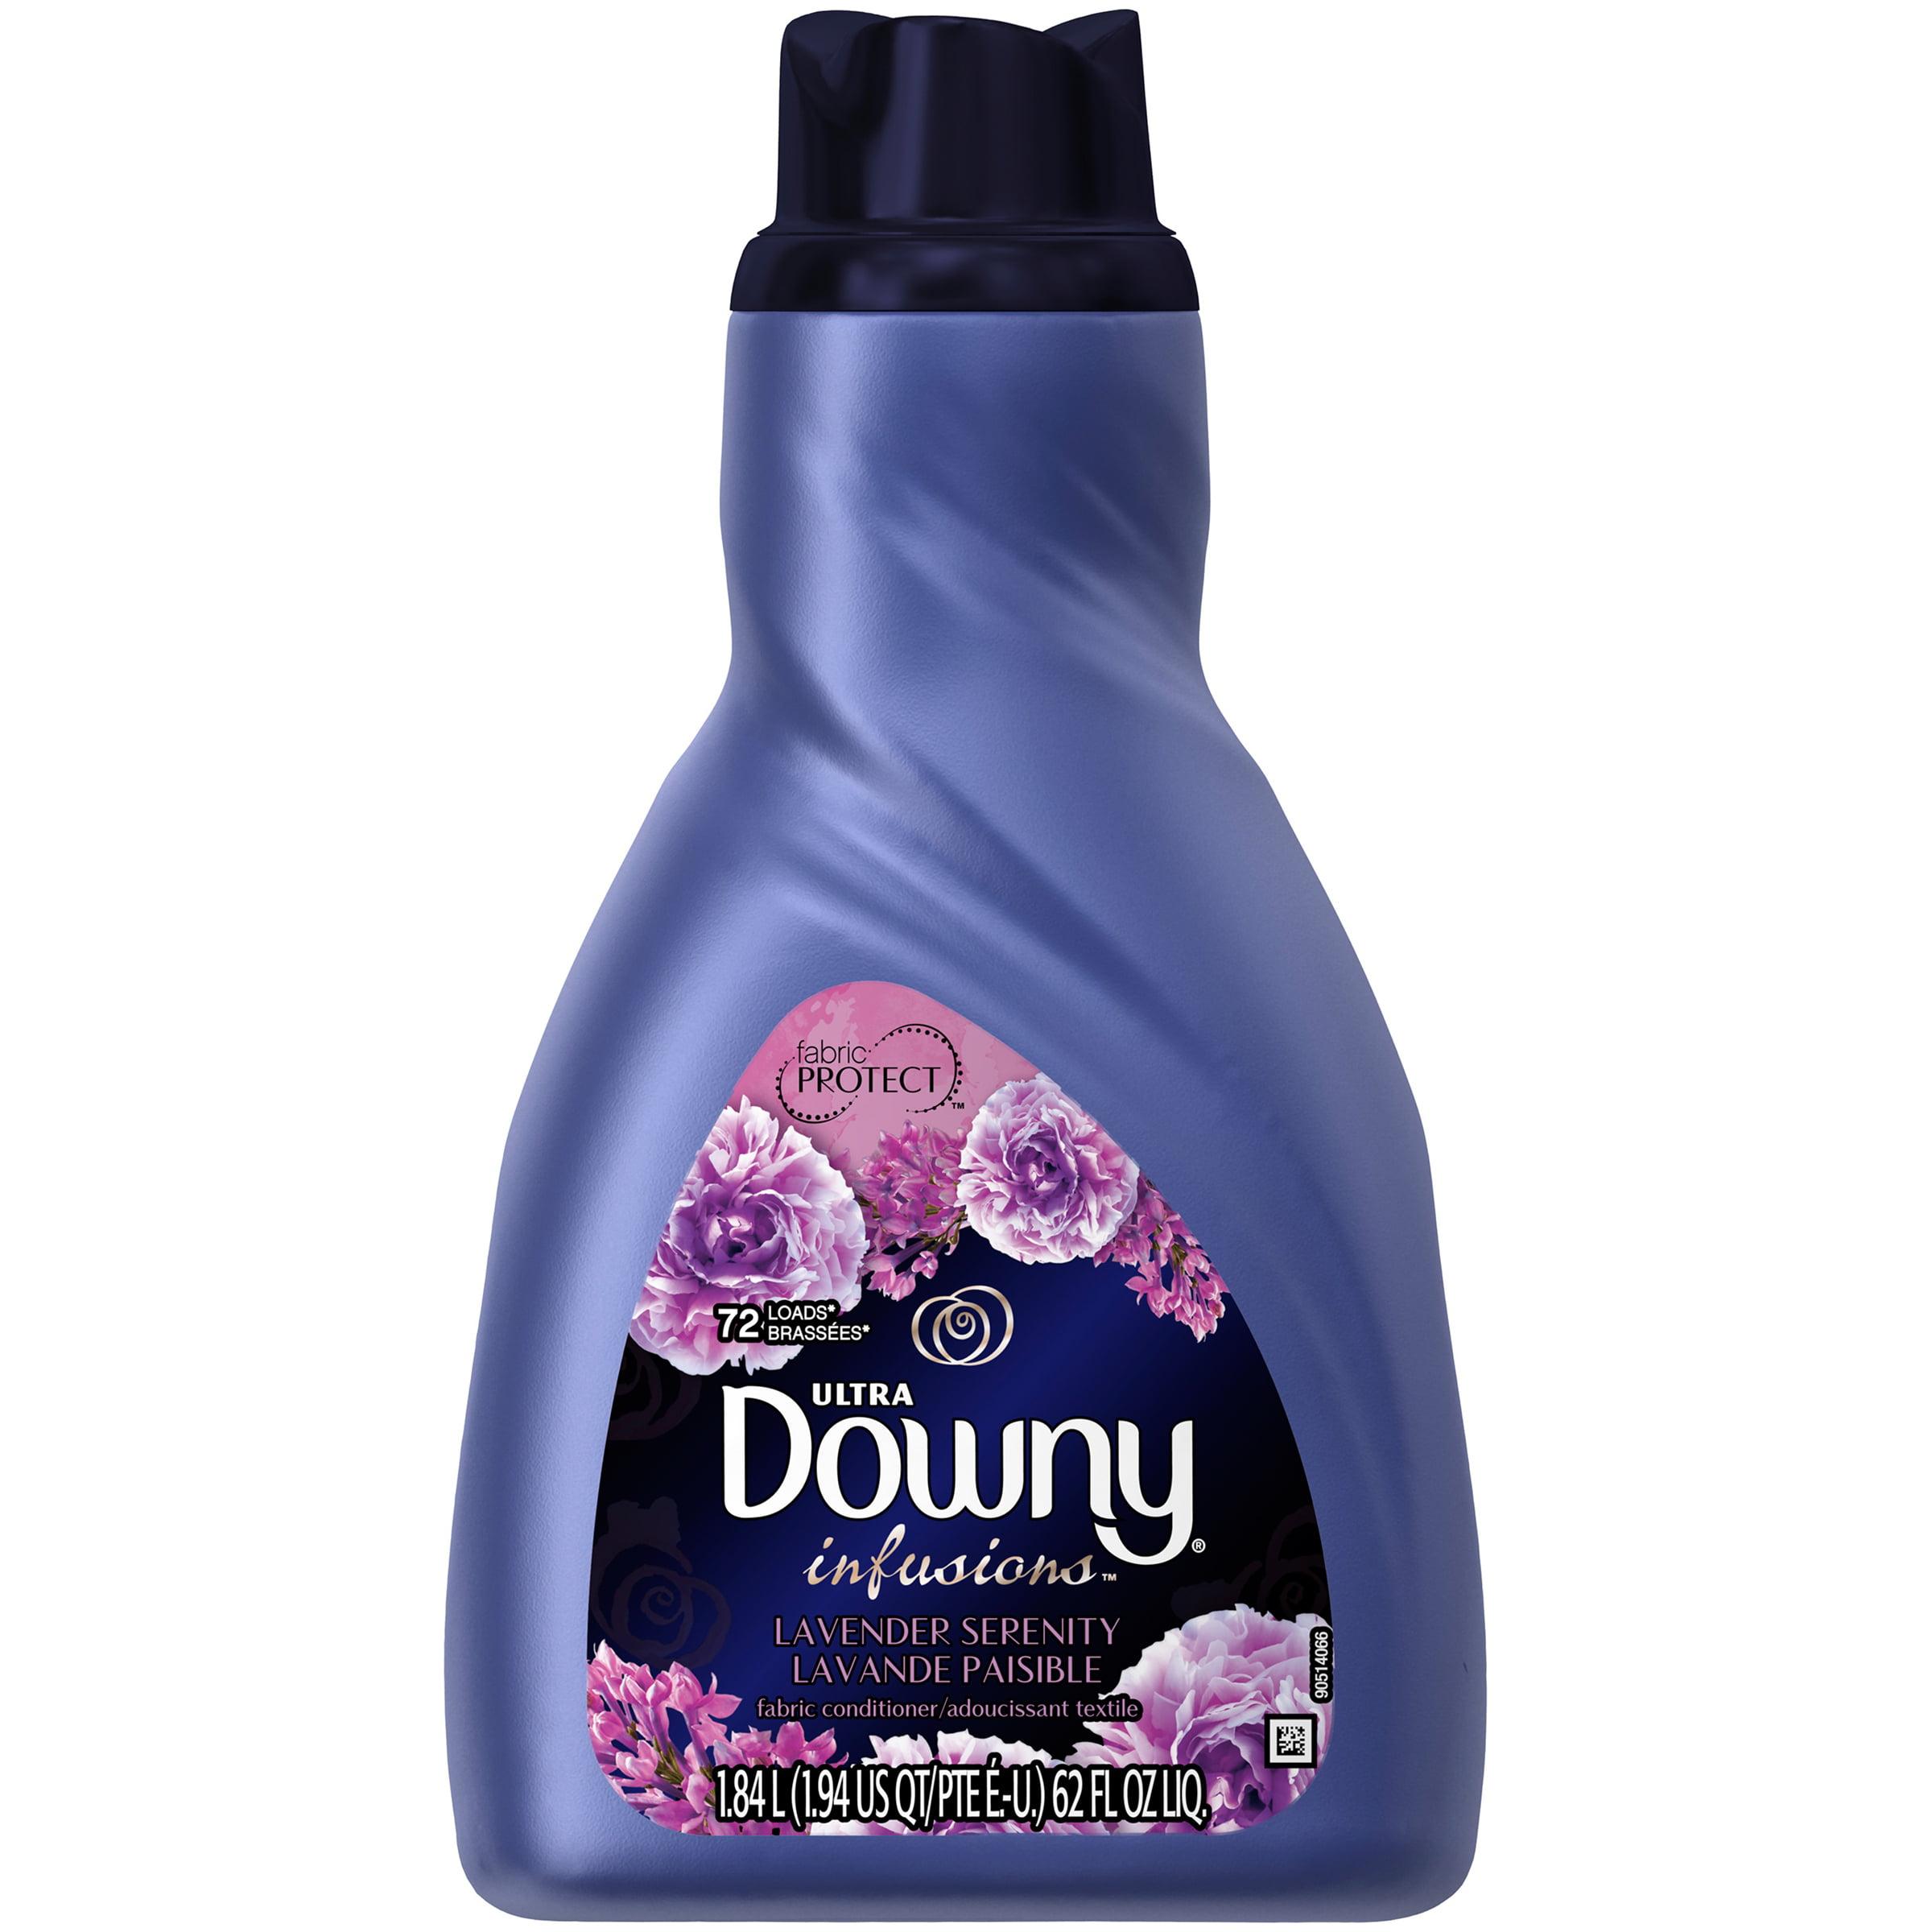 Downy Ultra Infusions Liquid Fabric Conditioner, Lavender Serenity, 72 Loads 62 fl oz